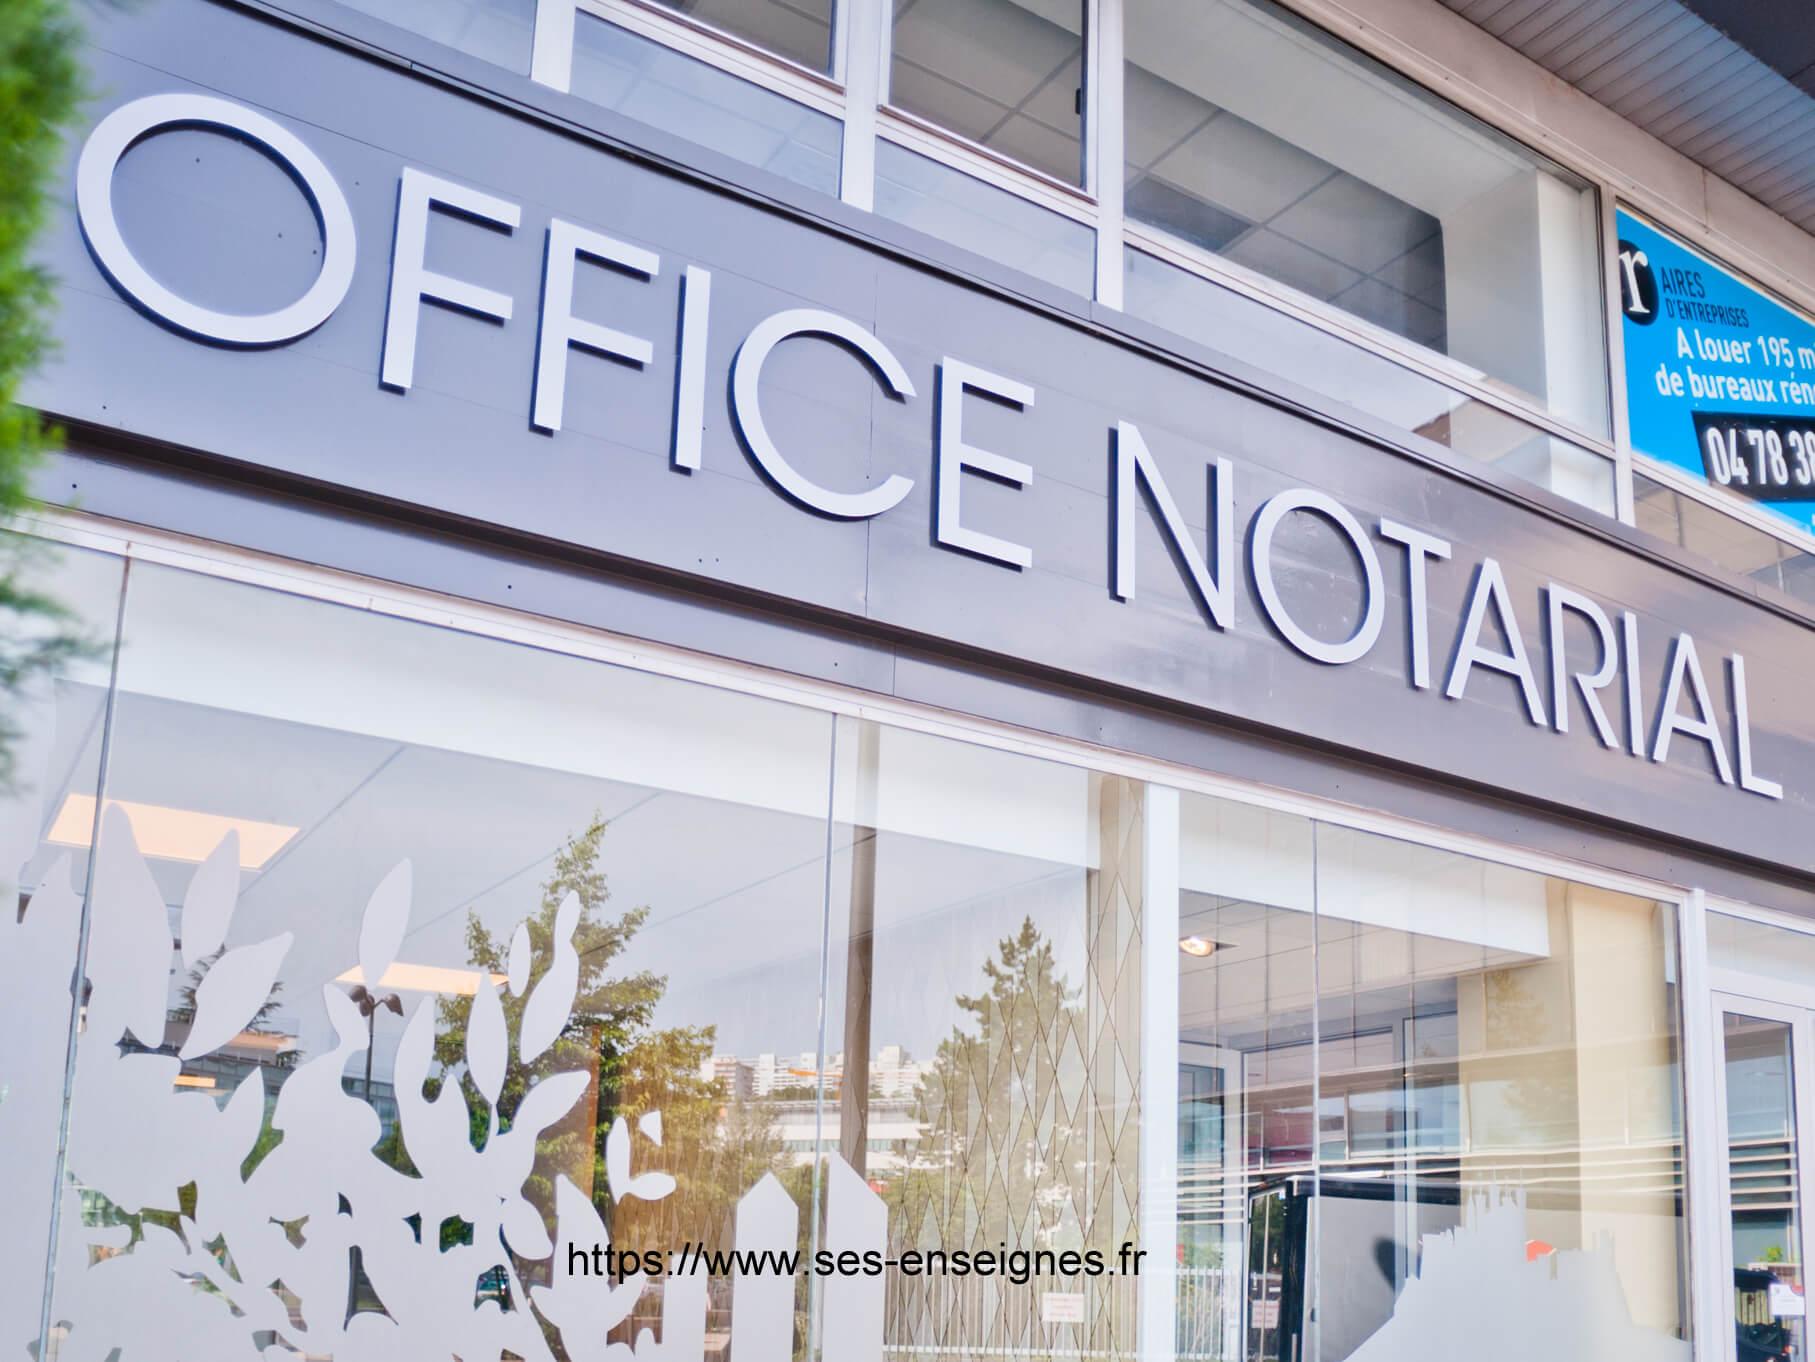 Enseigne Lyon Notaire 69009 - Fabrication et installation Enseigne -Enseigniste SES Grigny Lyon